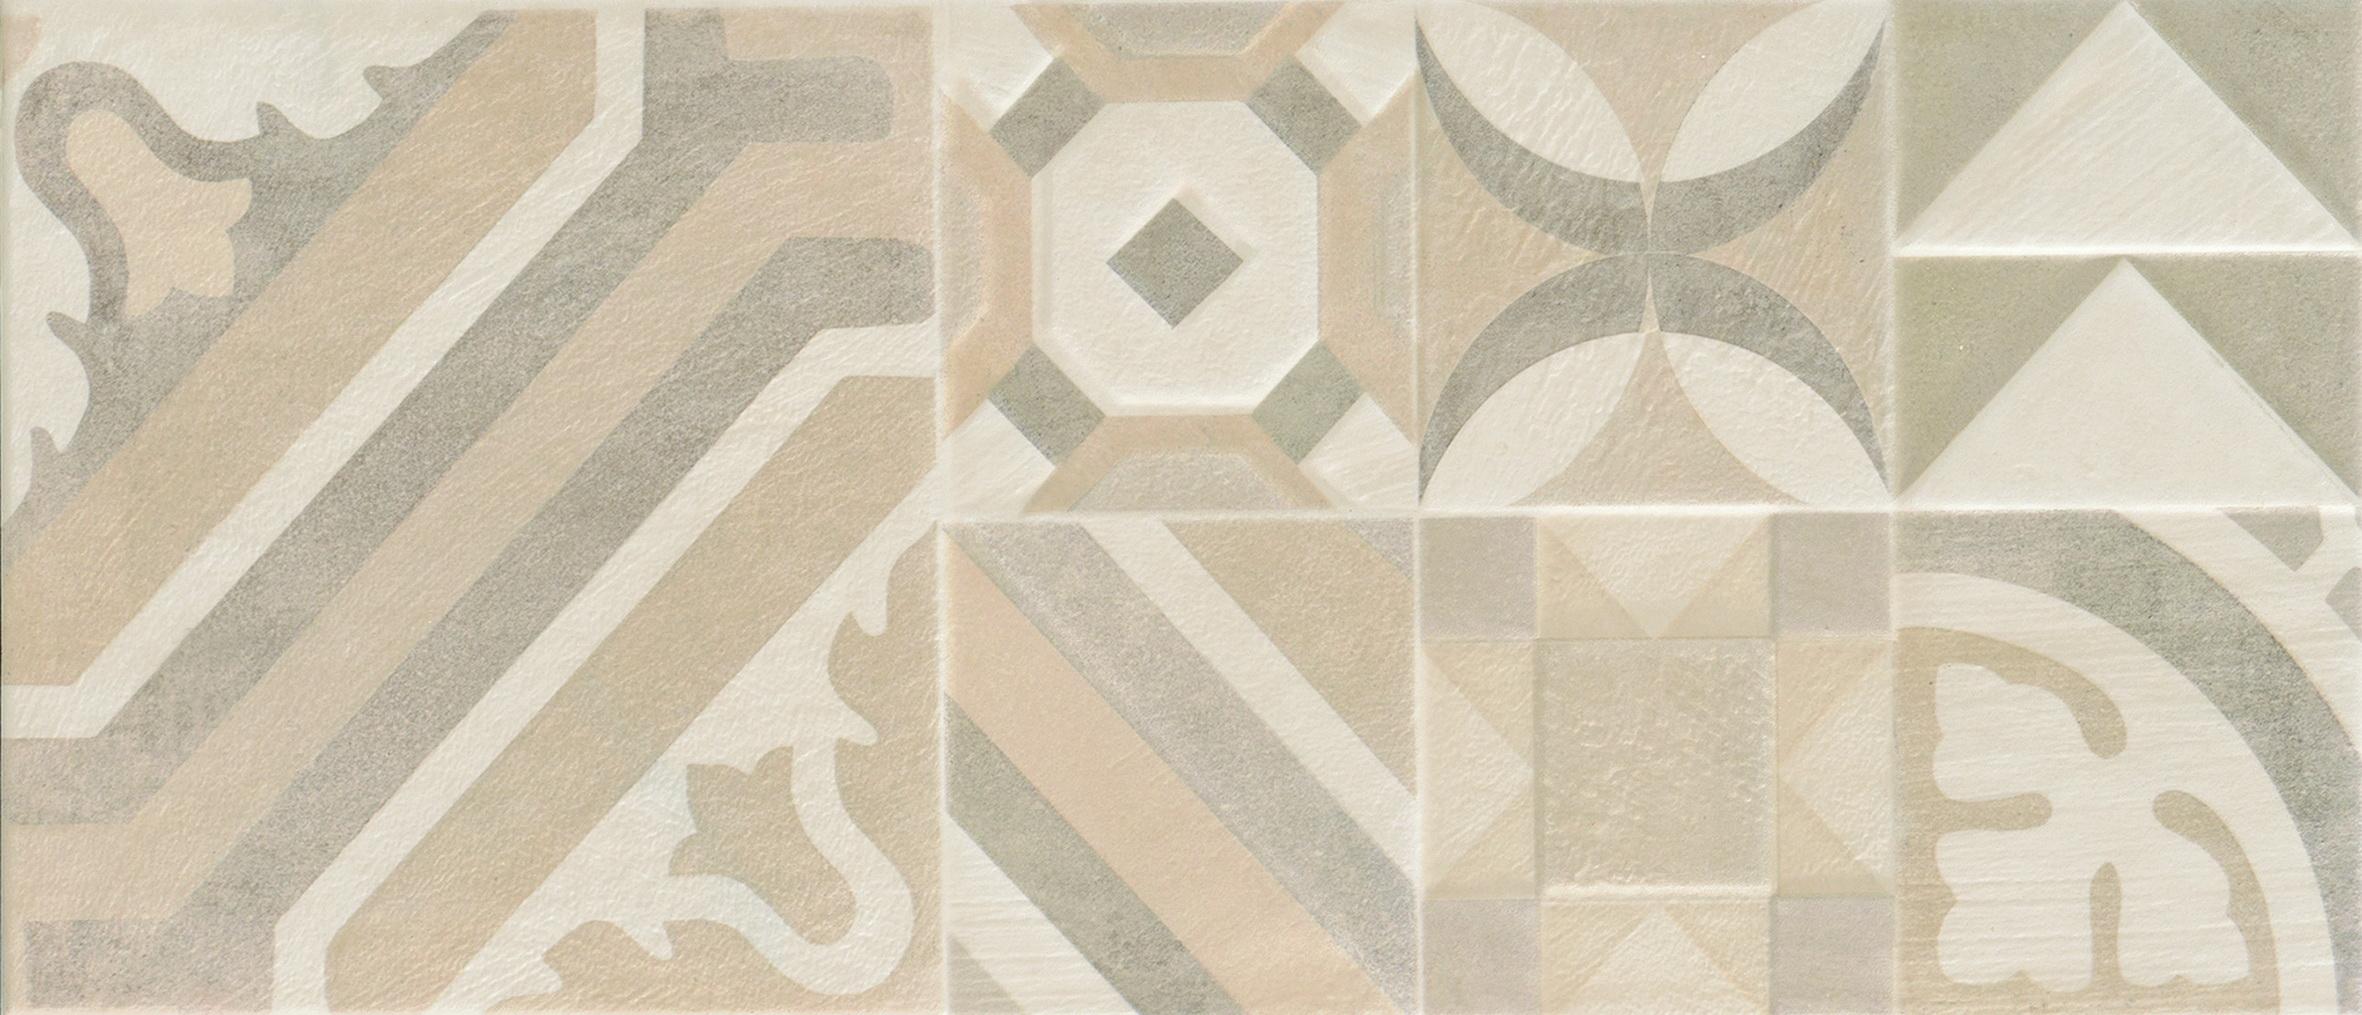 Настенная плитка Naxos Argille +18470 89089 Evoque Rust цена